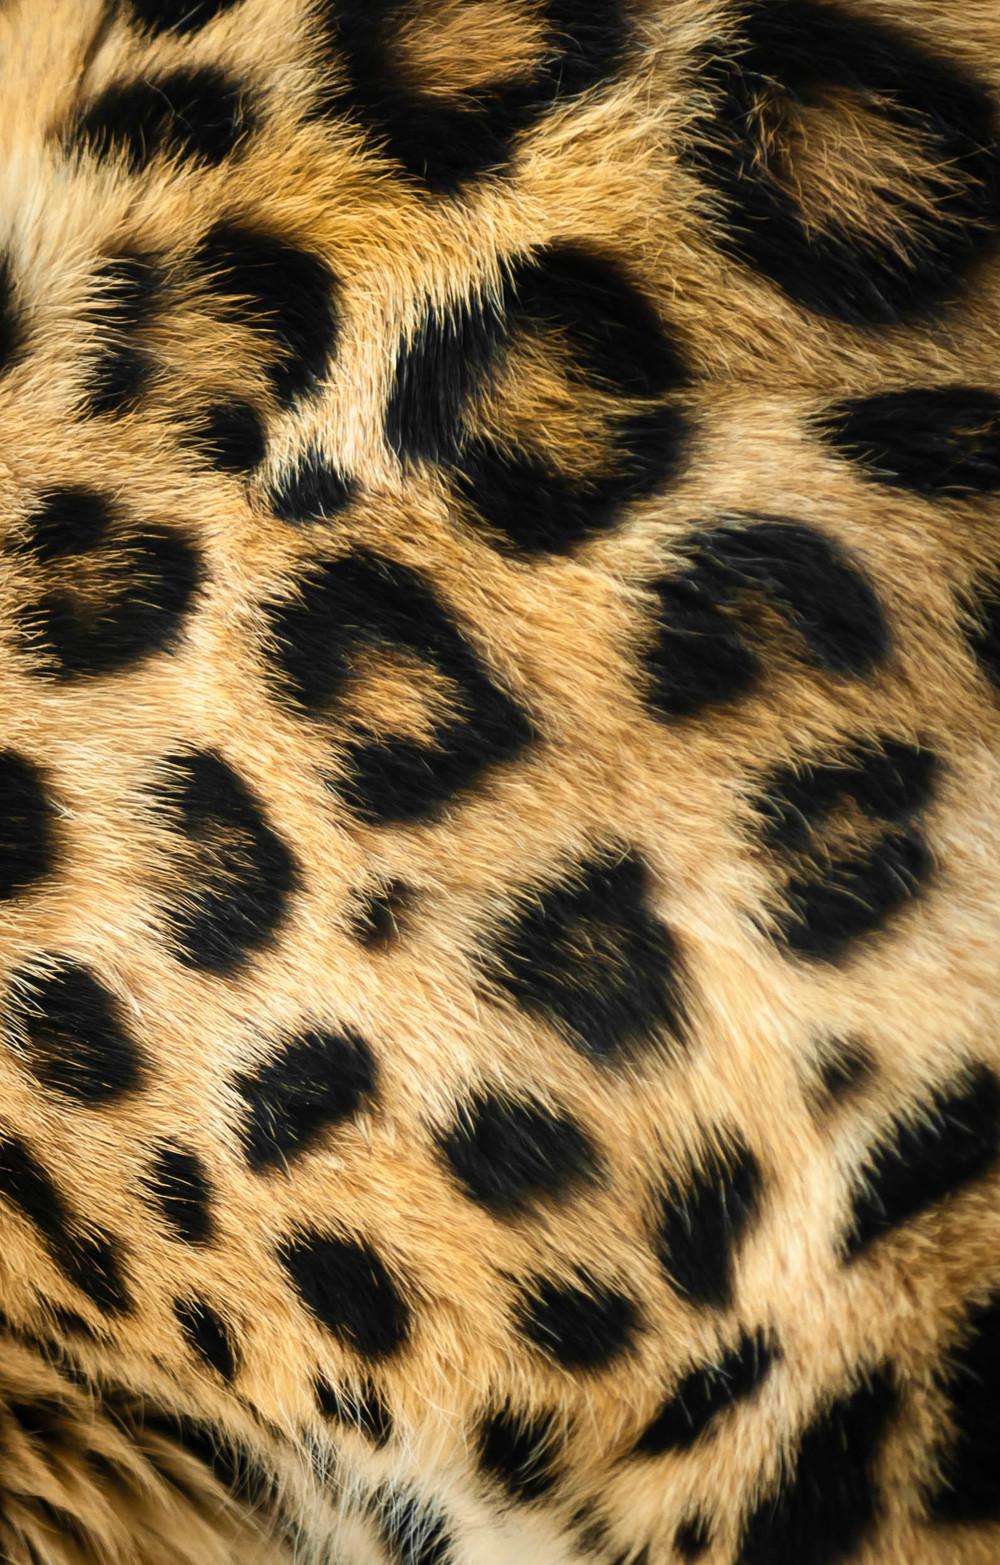 amur leopard Panthera pardus orientalis